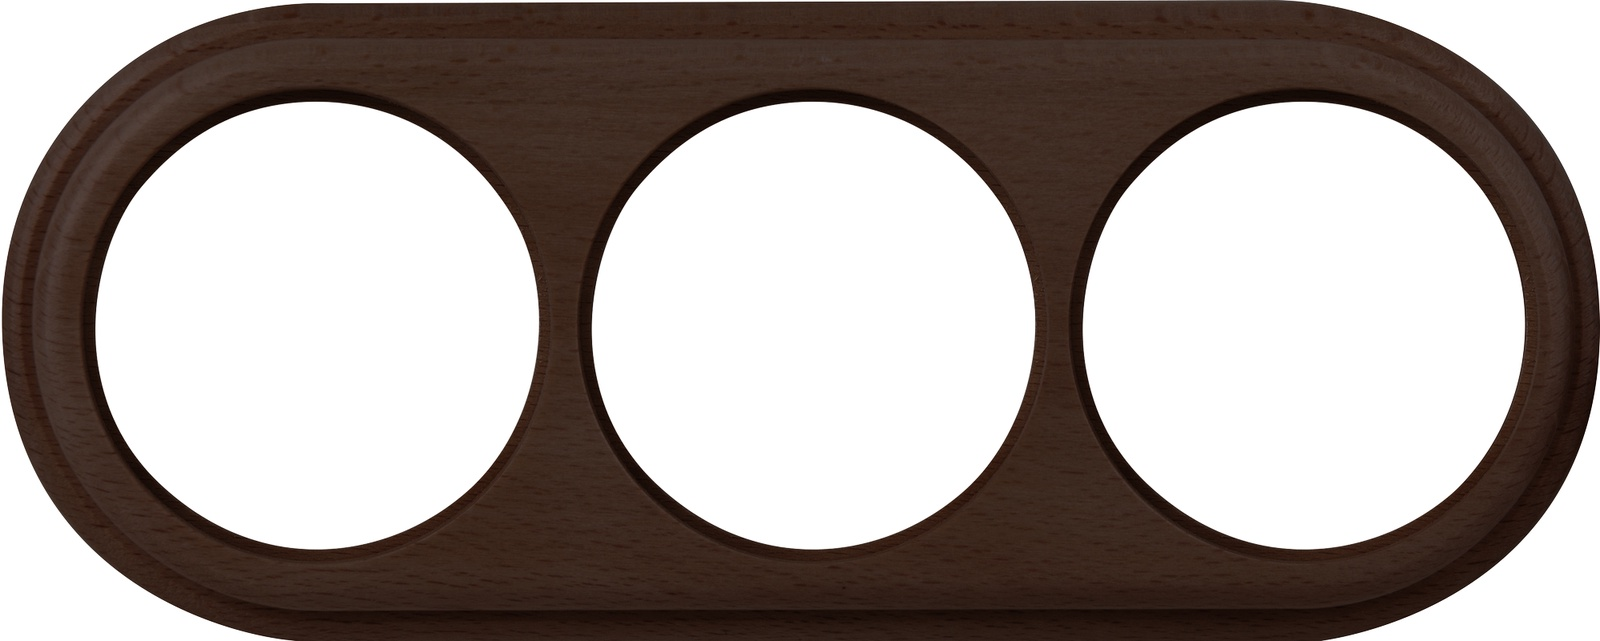 WL15-frame-03  Рамка на 3 поста венге